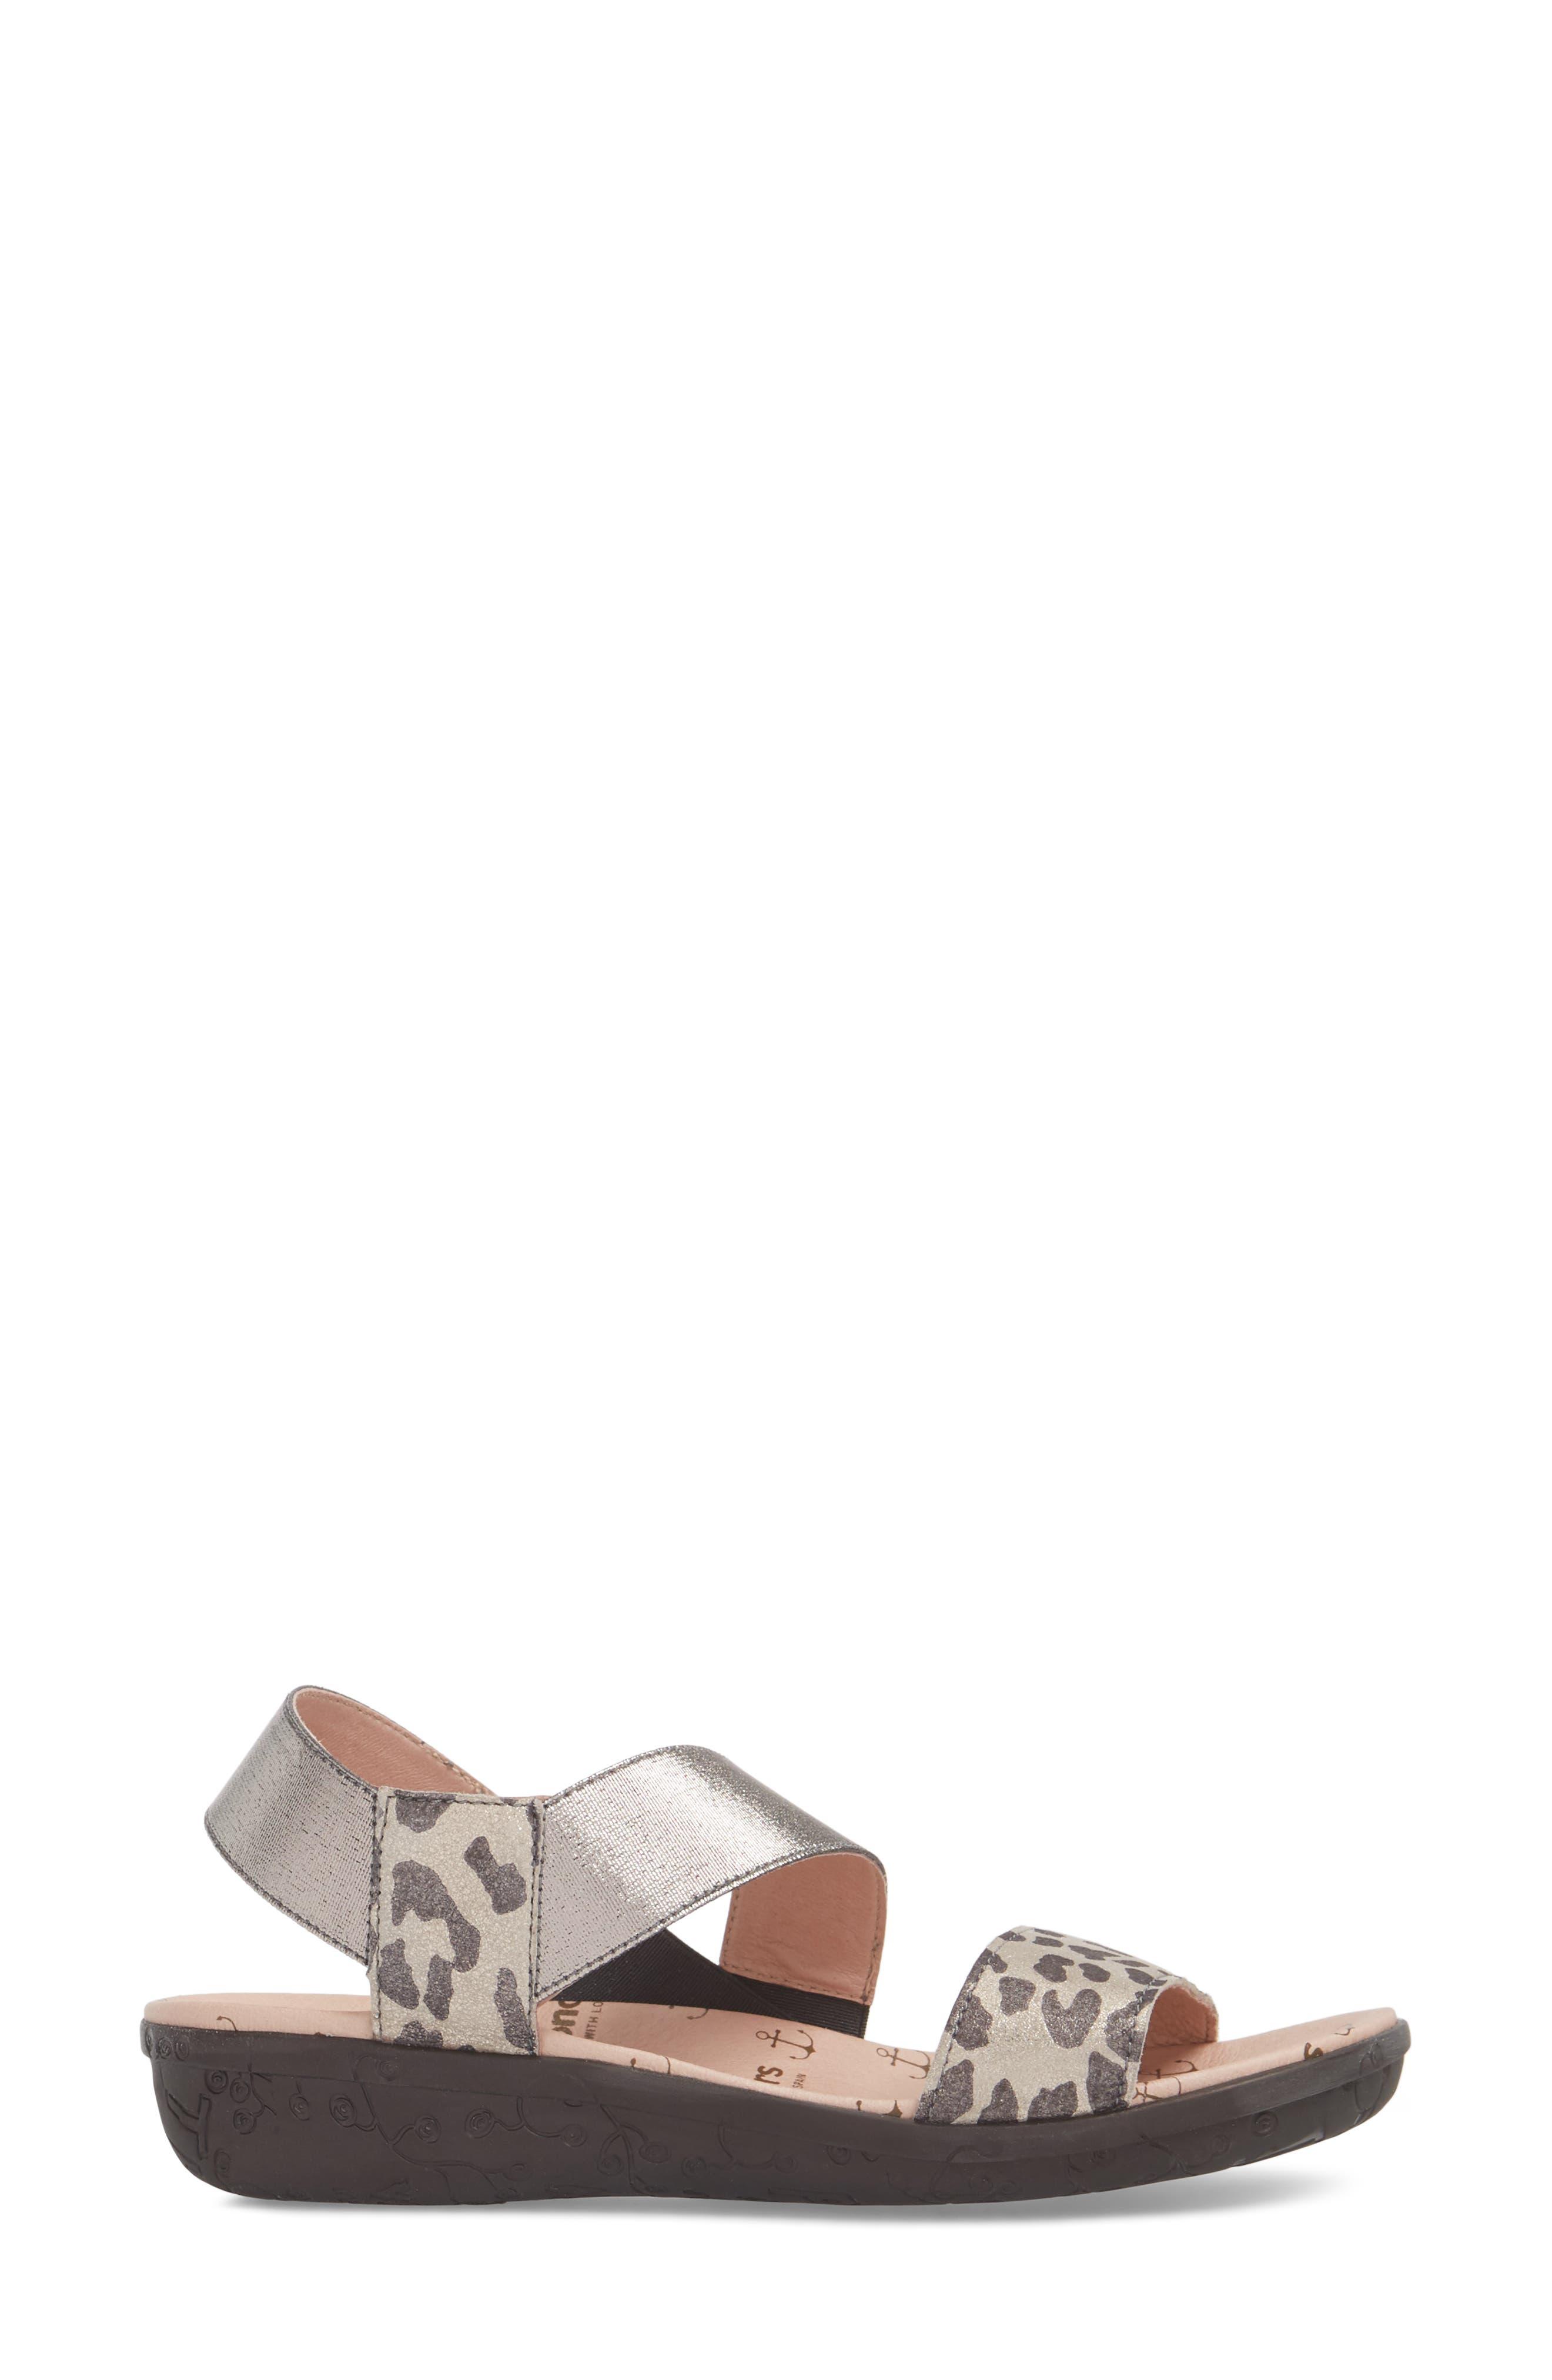 Slingback Sandal,                             Alternate thumbnail 3, color,                             Leo Leather